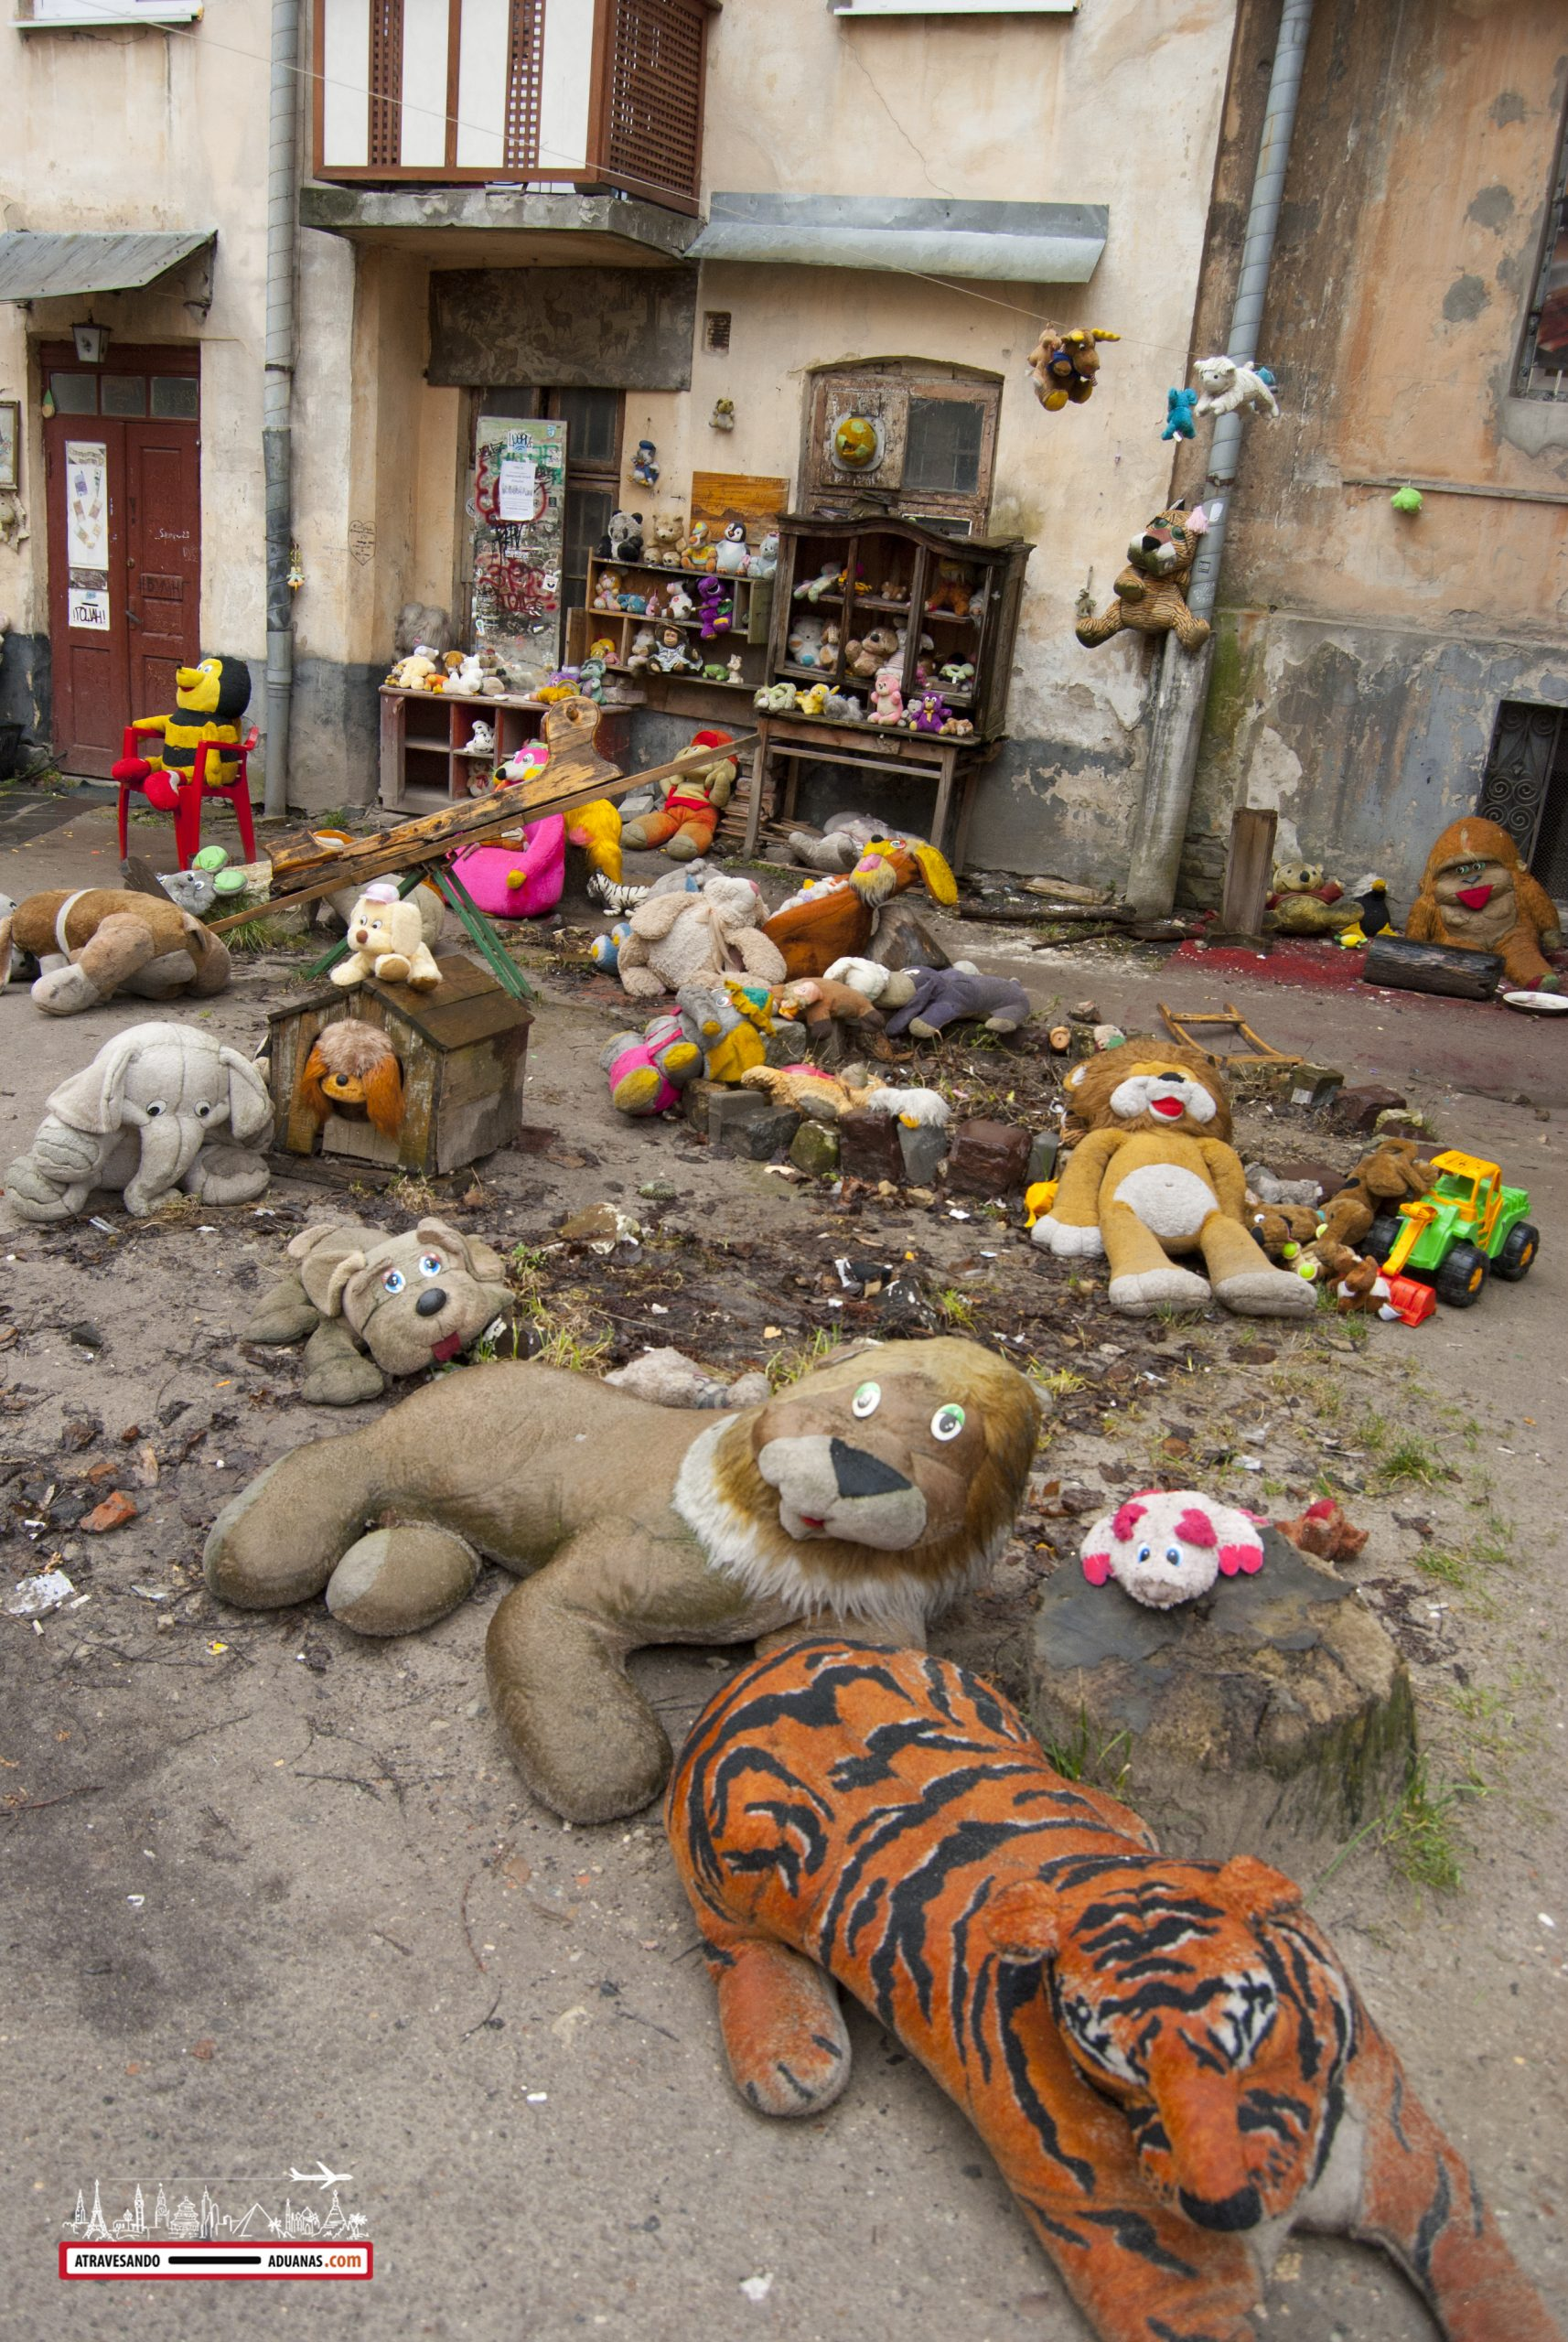 casa de los juguetes abandonados de lviv